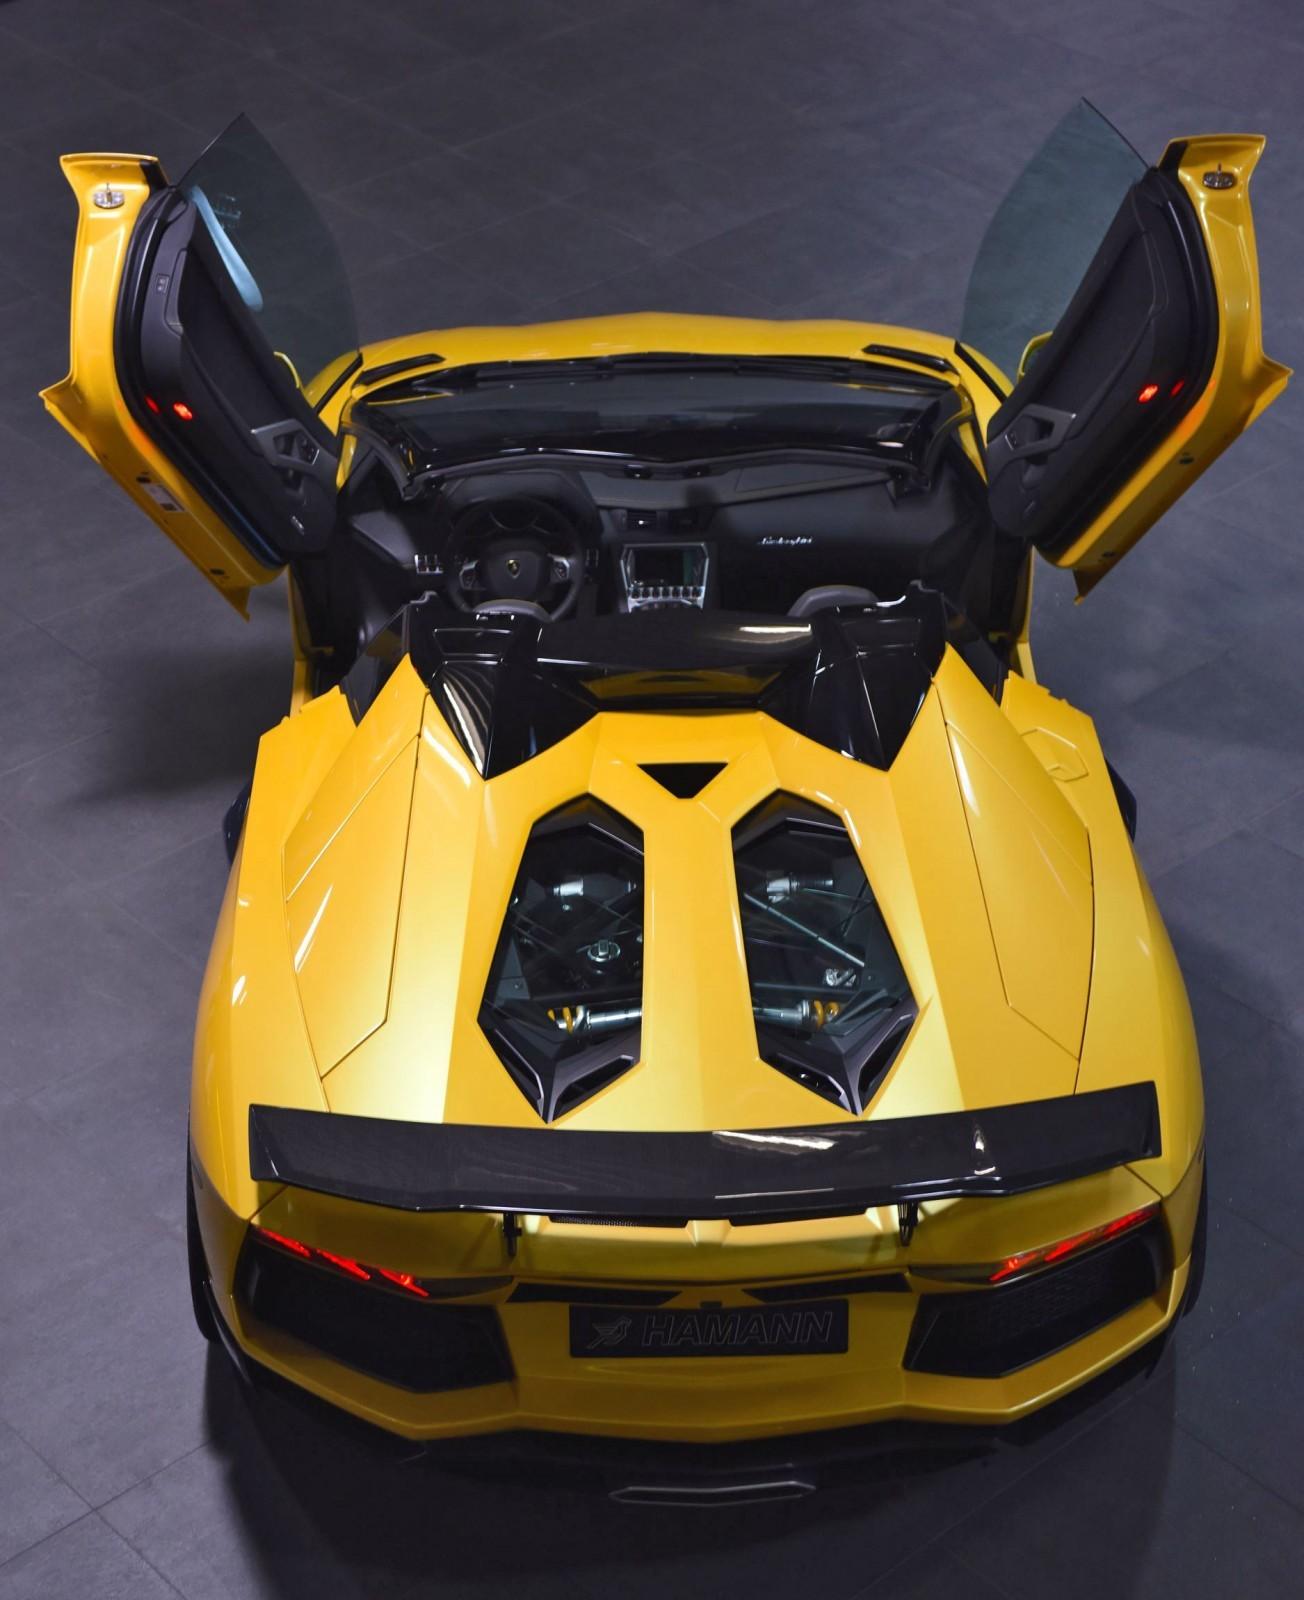 Lamborghini Aventador Roadster Yellow | www.imgkid.com ...